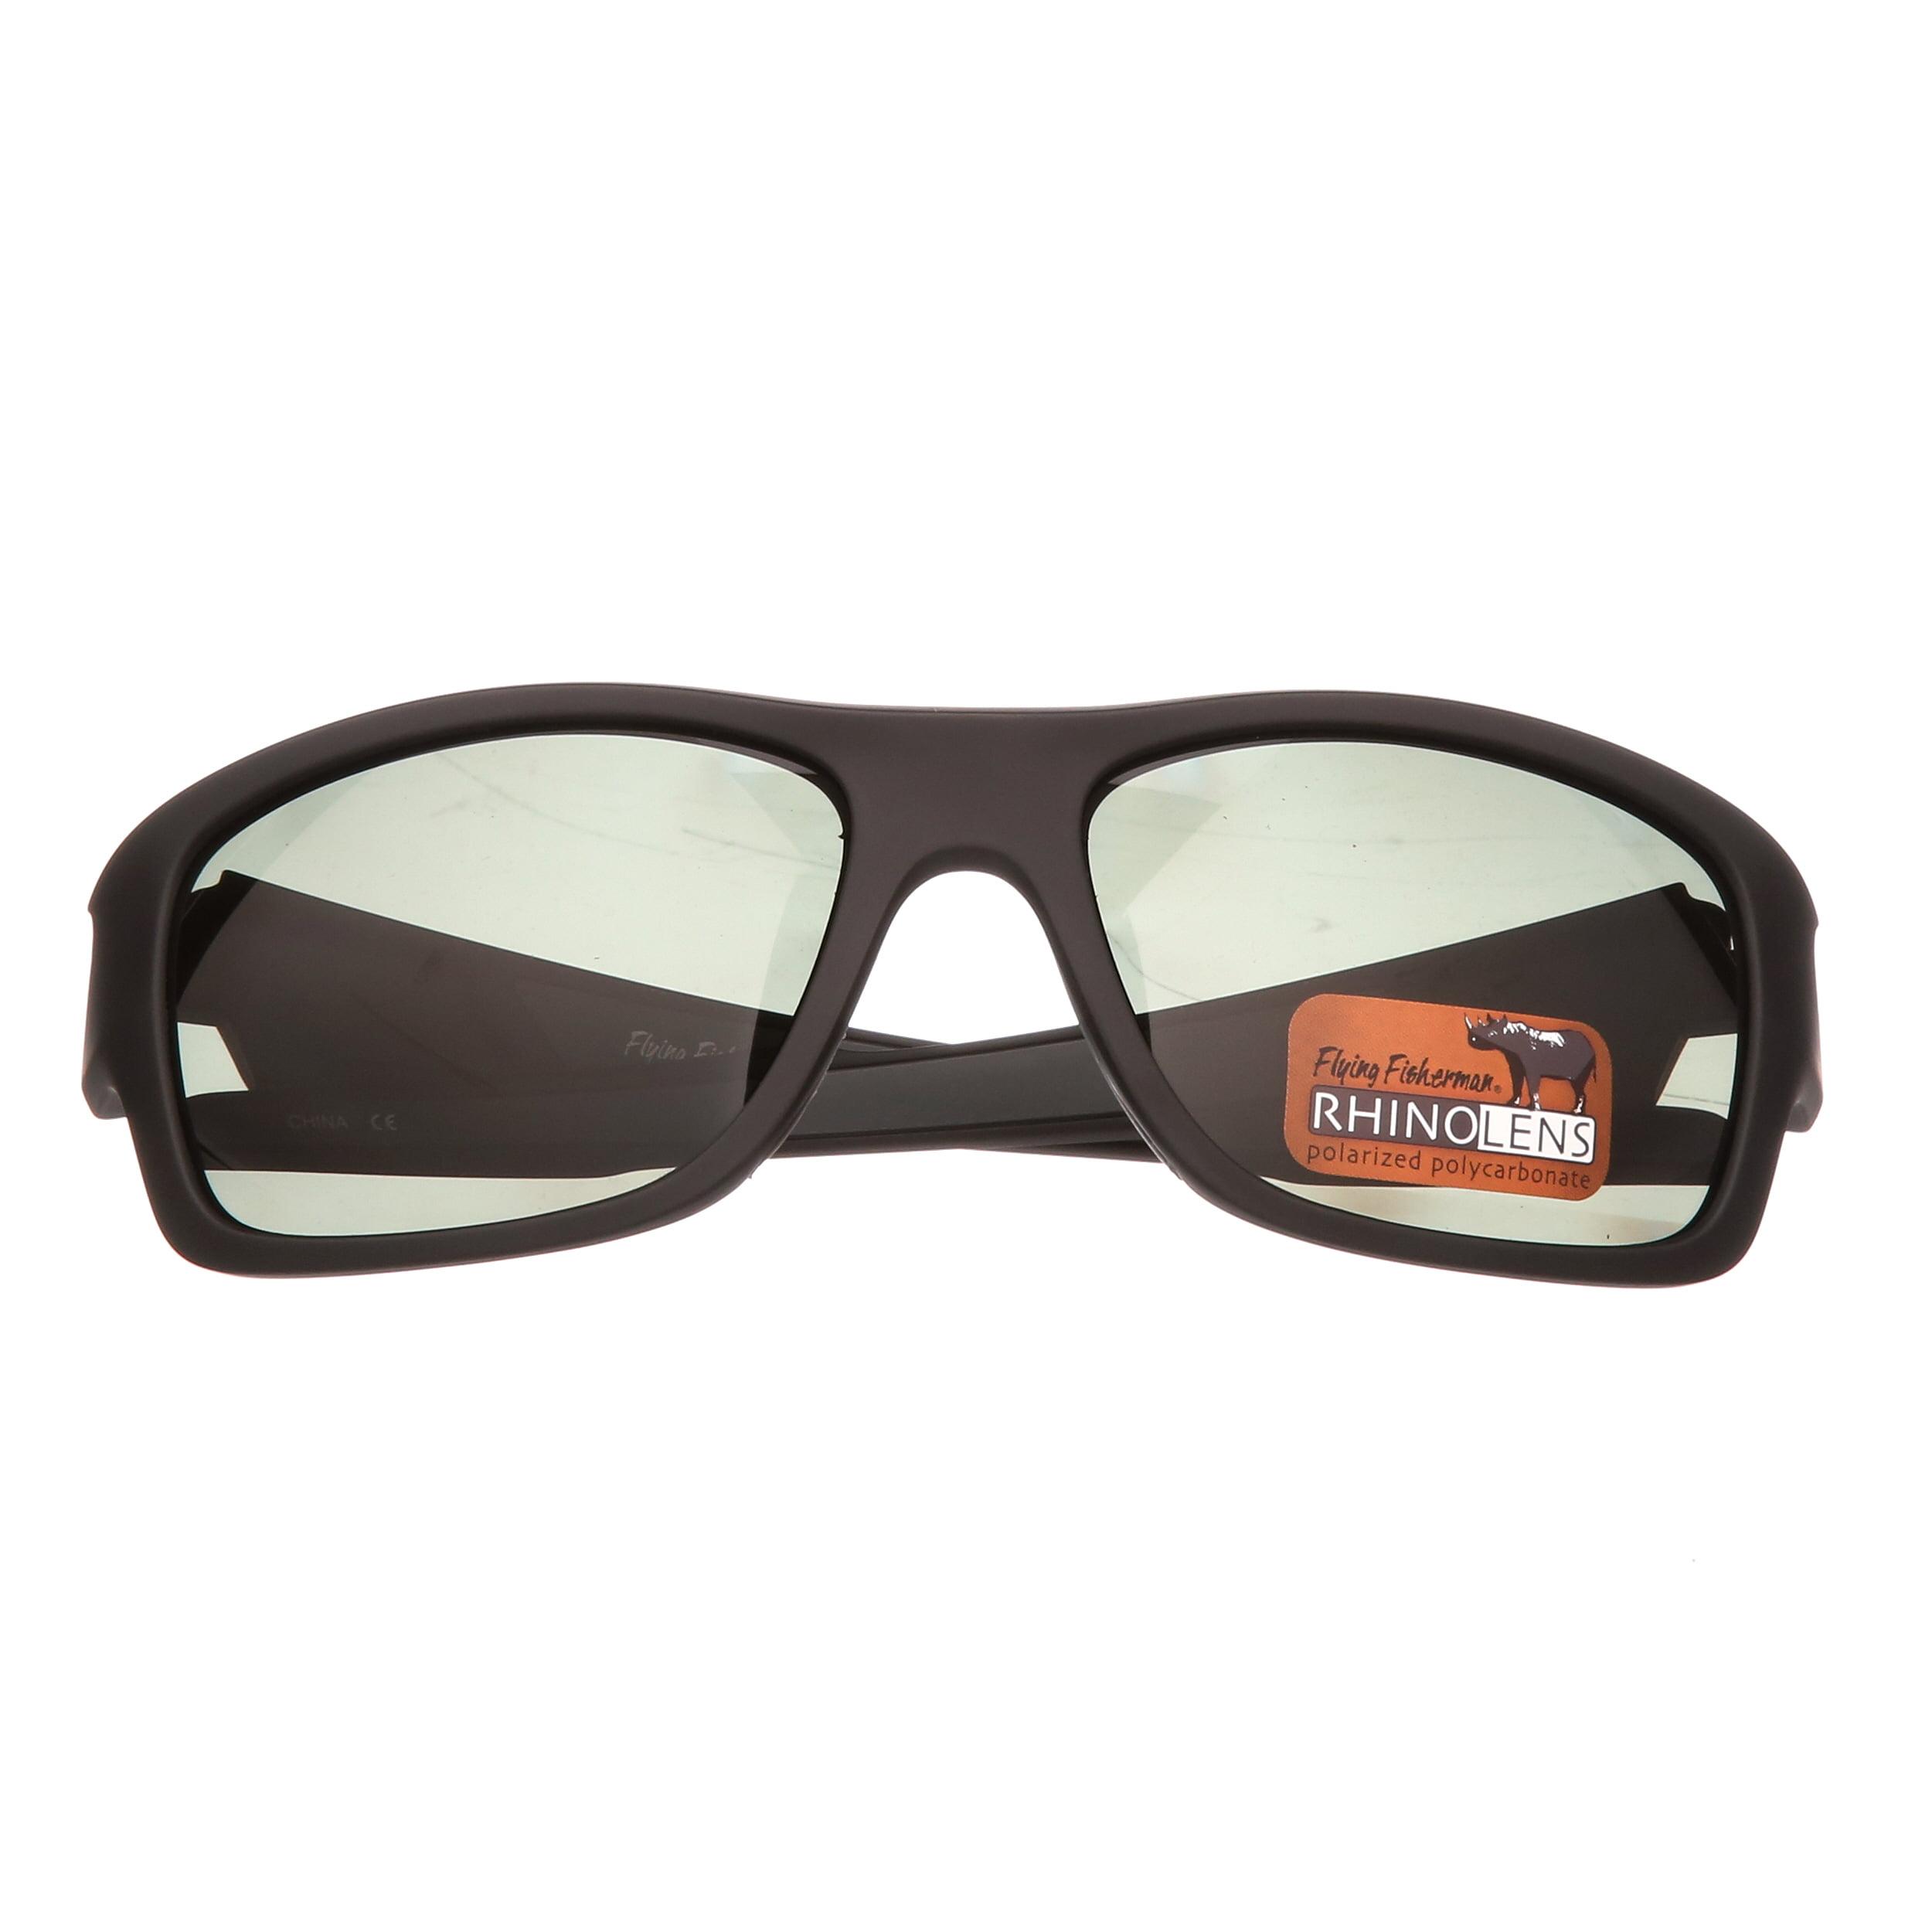 6a755af47a Flying Fisherman Down Sea Polarized Sunglasses